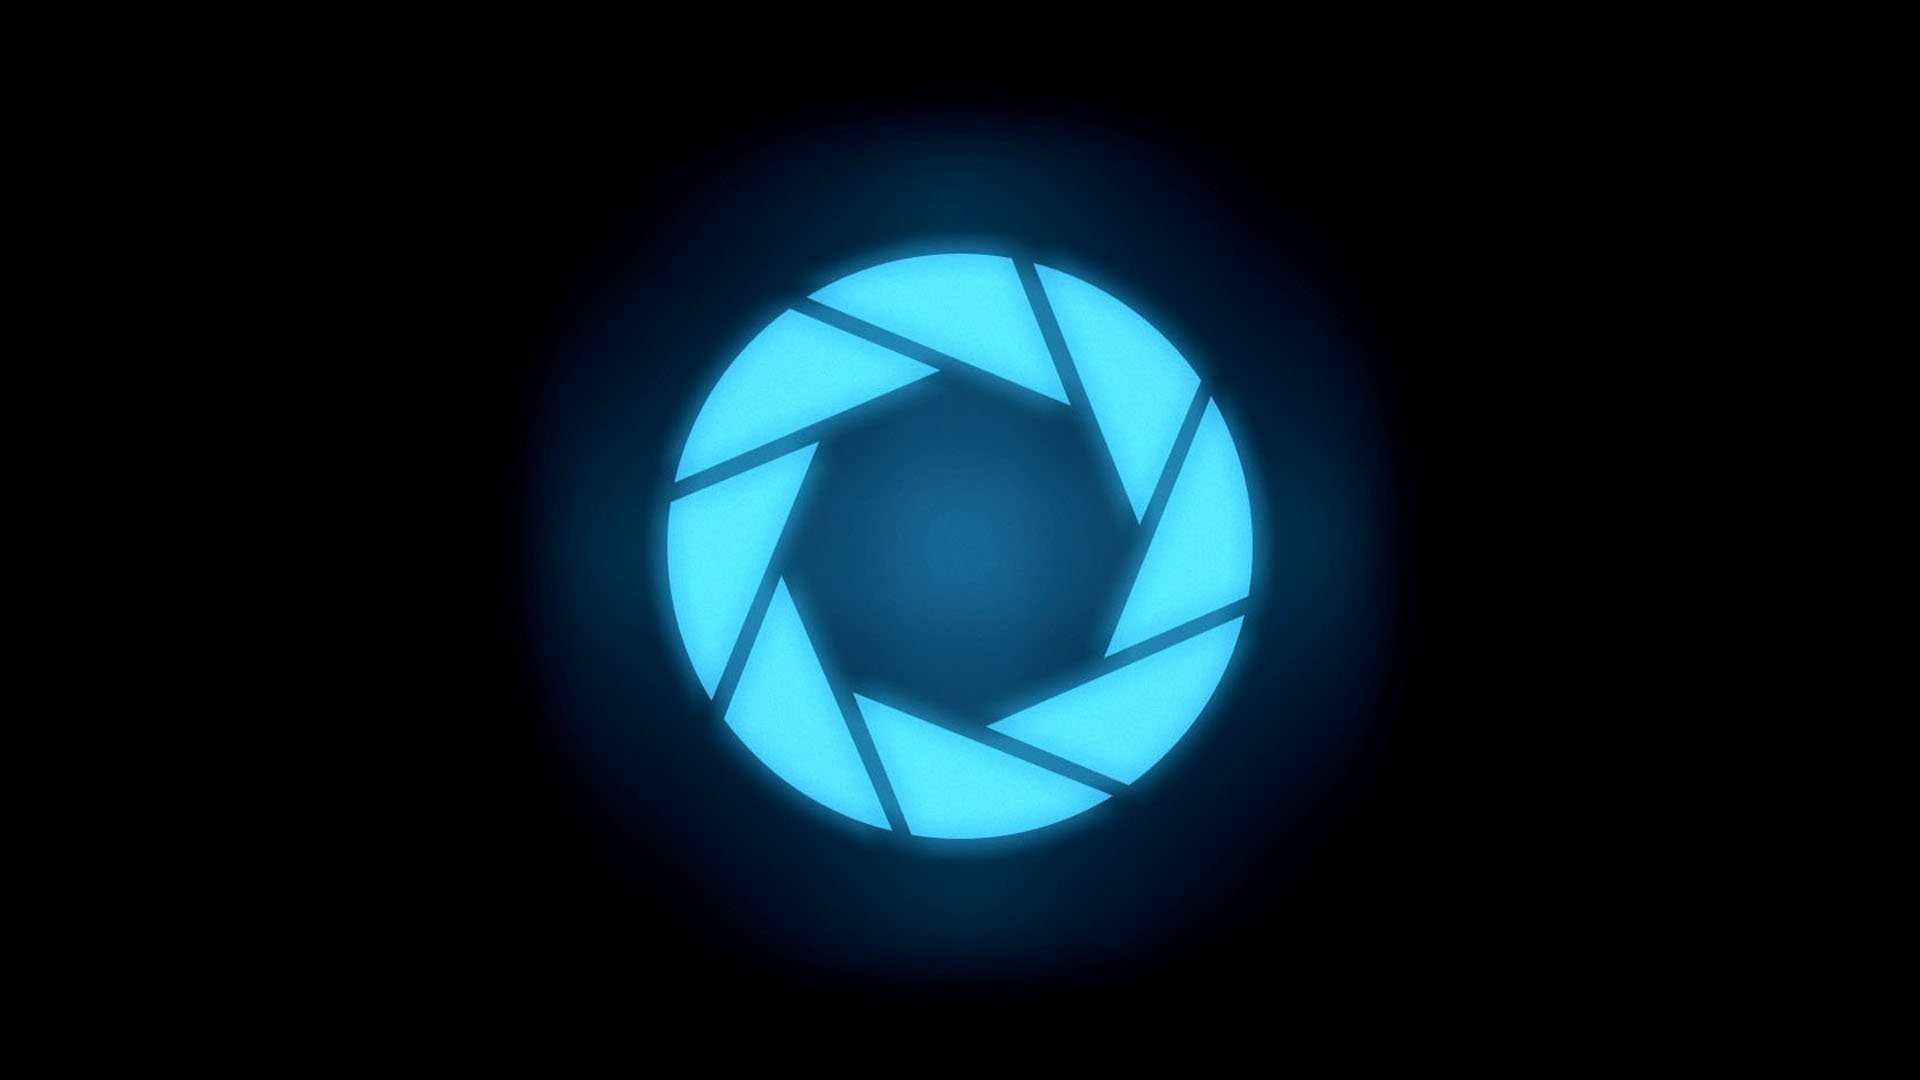 … aperture science 729672 walldevil; portal aperture science hd desktop  wallpaper fullscreen …